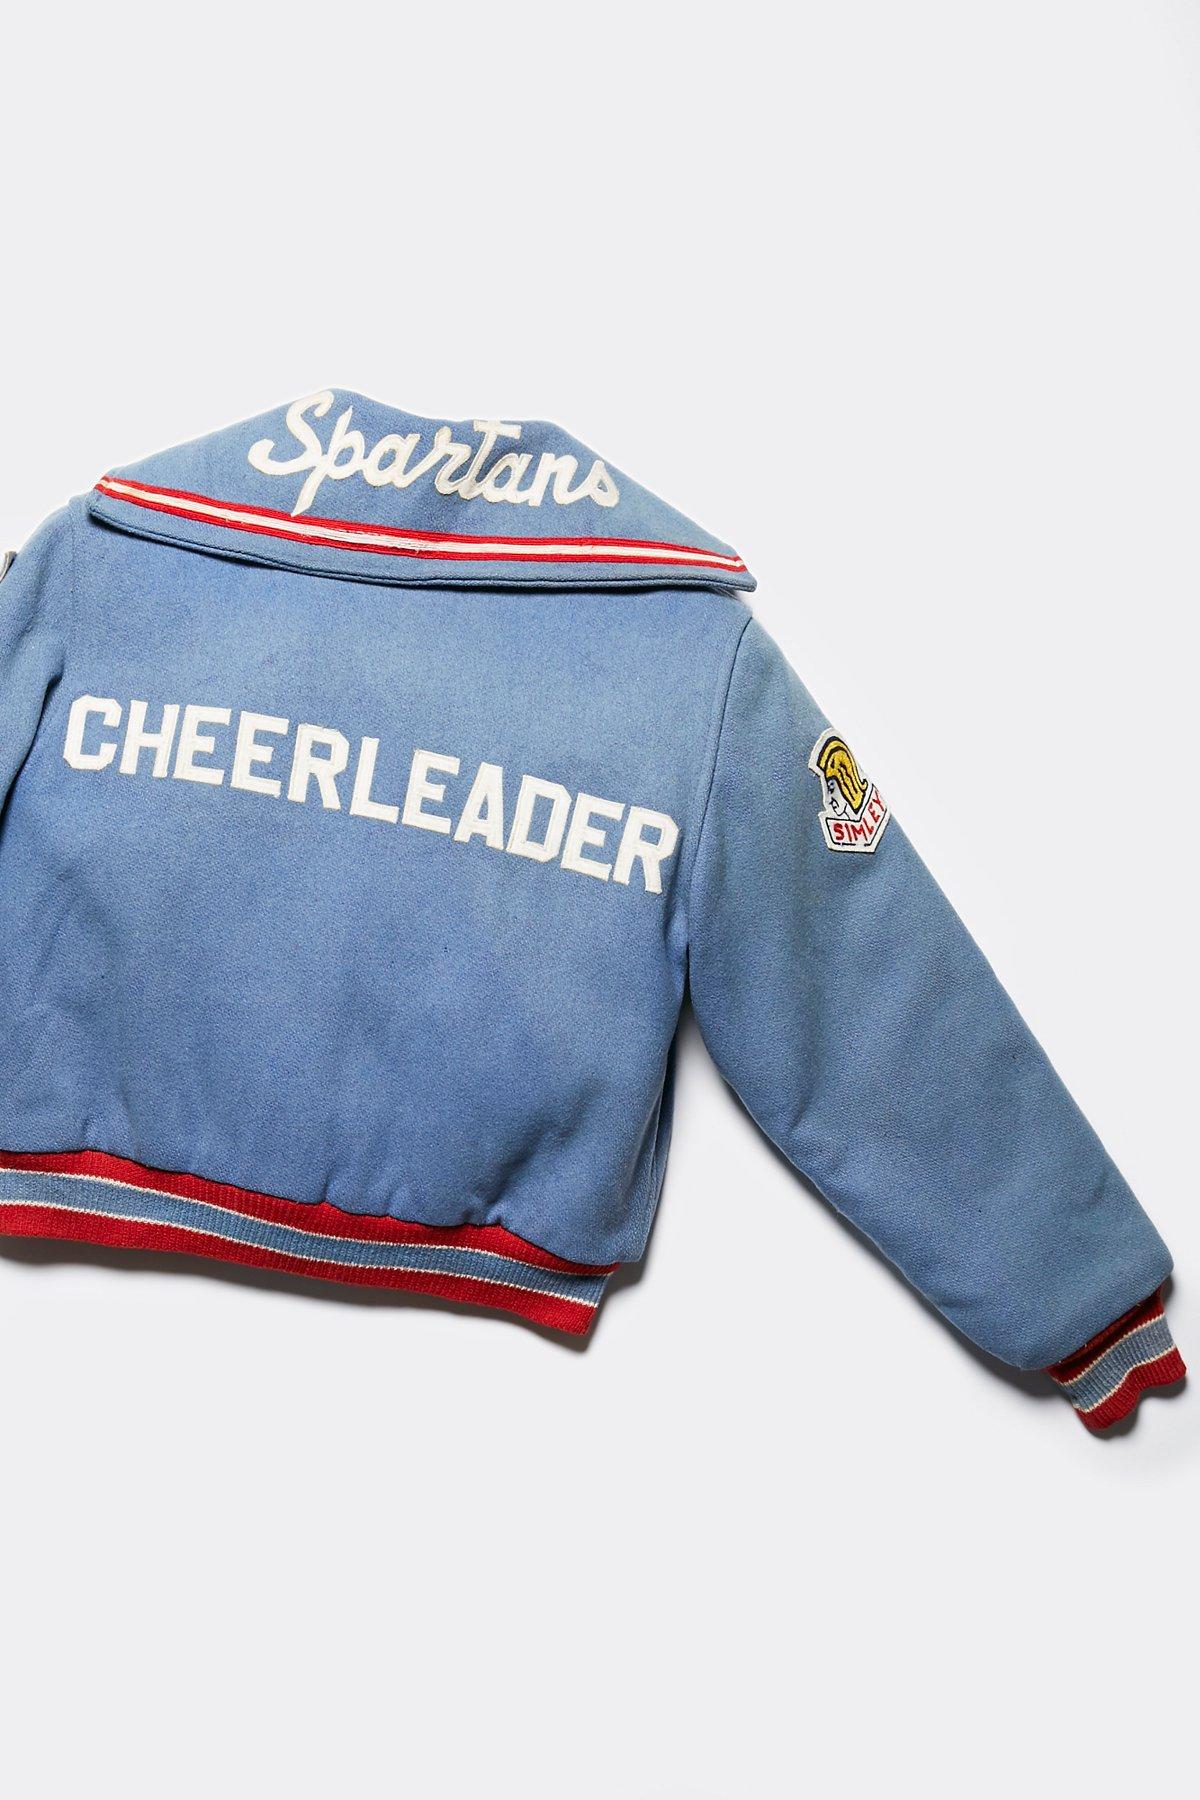 Vintage 1960s Cheer Letterman Jacket